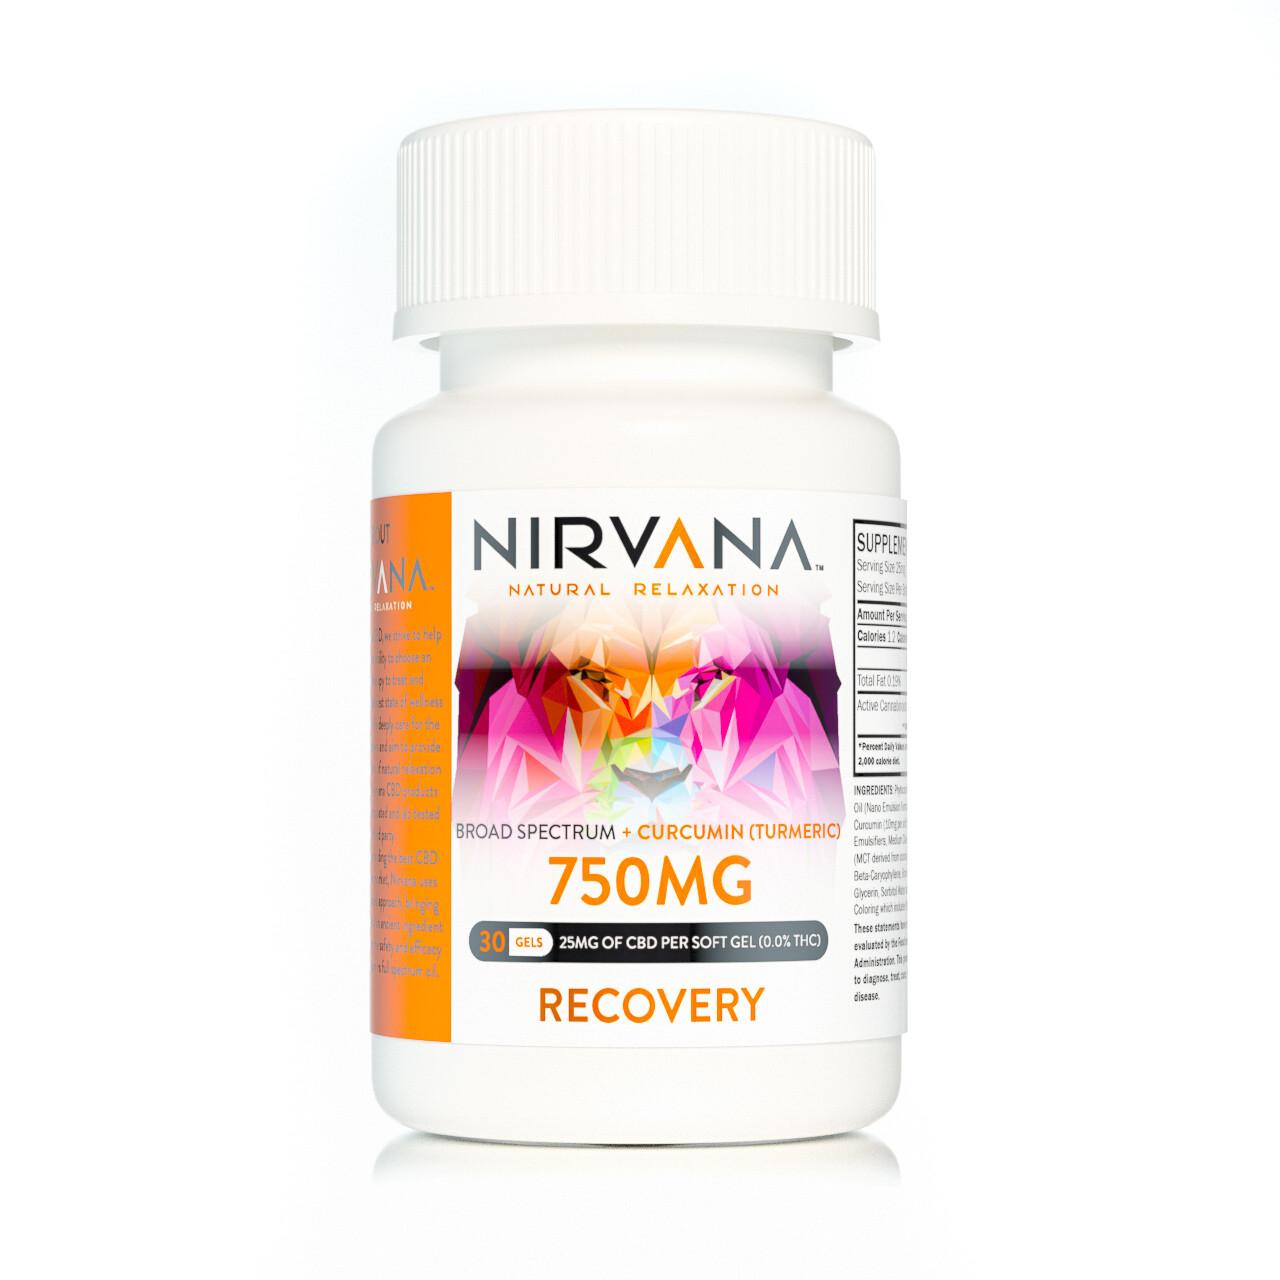 NIRVANA 750mg Broad Spectrum Recovery Gel Capsules - 30 CT - 25mg per capsule w/ 10mg Circumin (Tumeric)